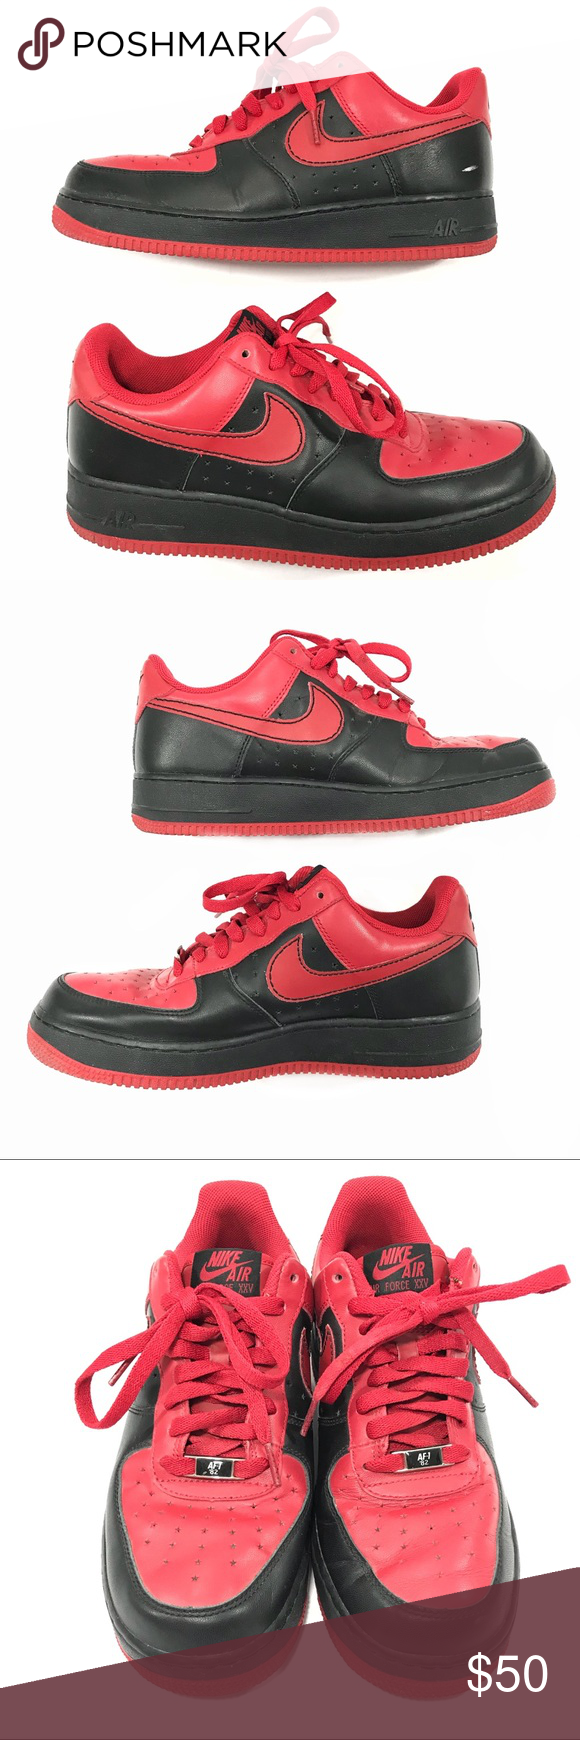 819acb2174d Nike Air Force 1 Low Barkley Brand  Nike Item name  Air Force 1 ...